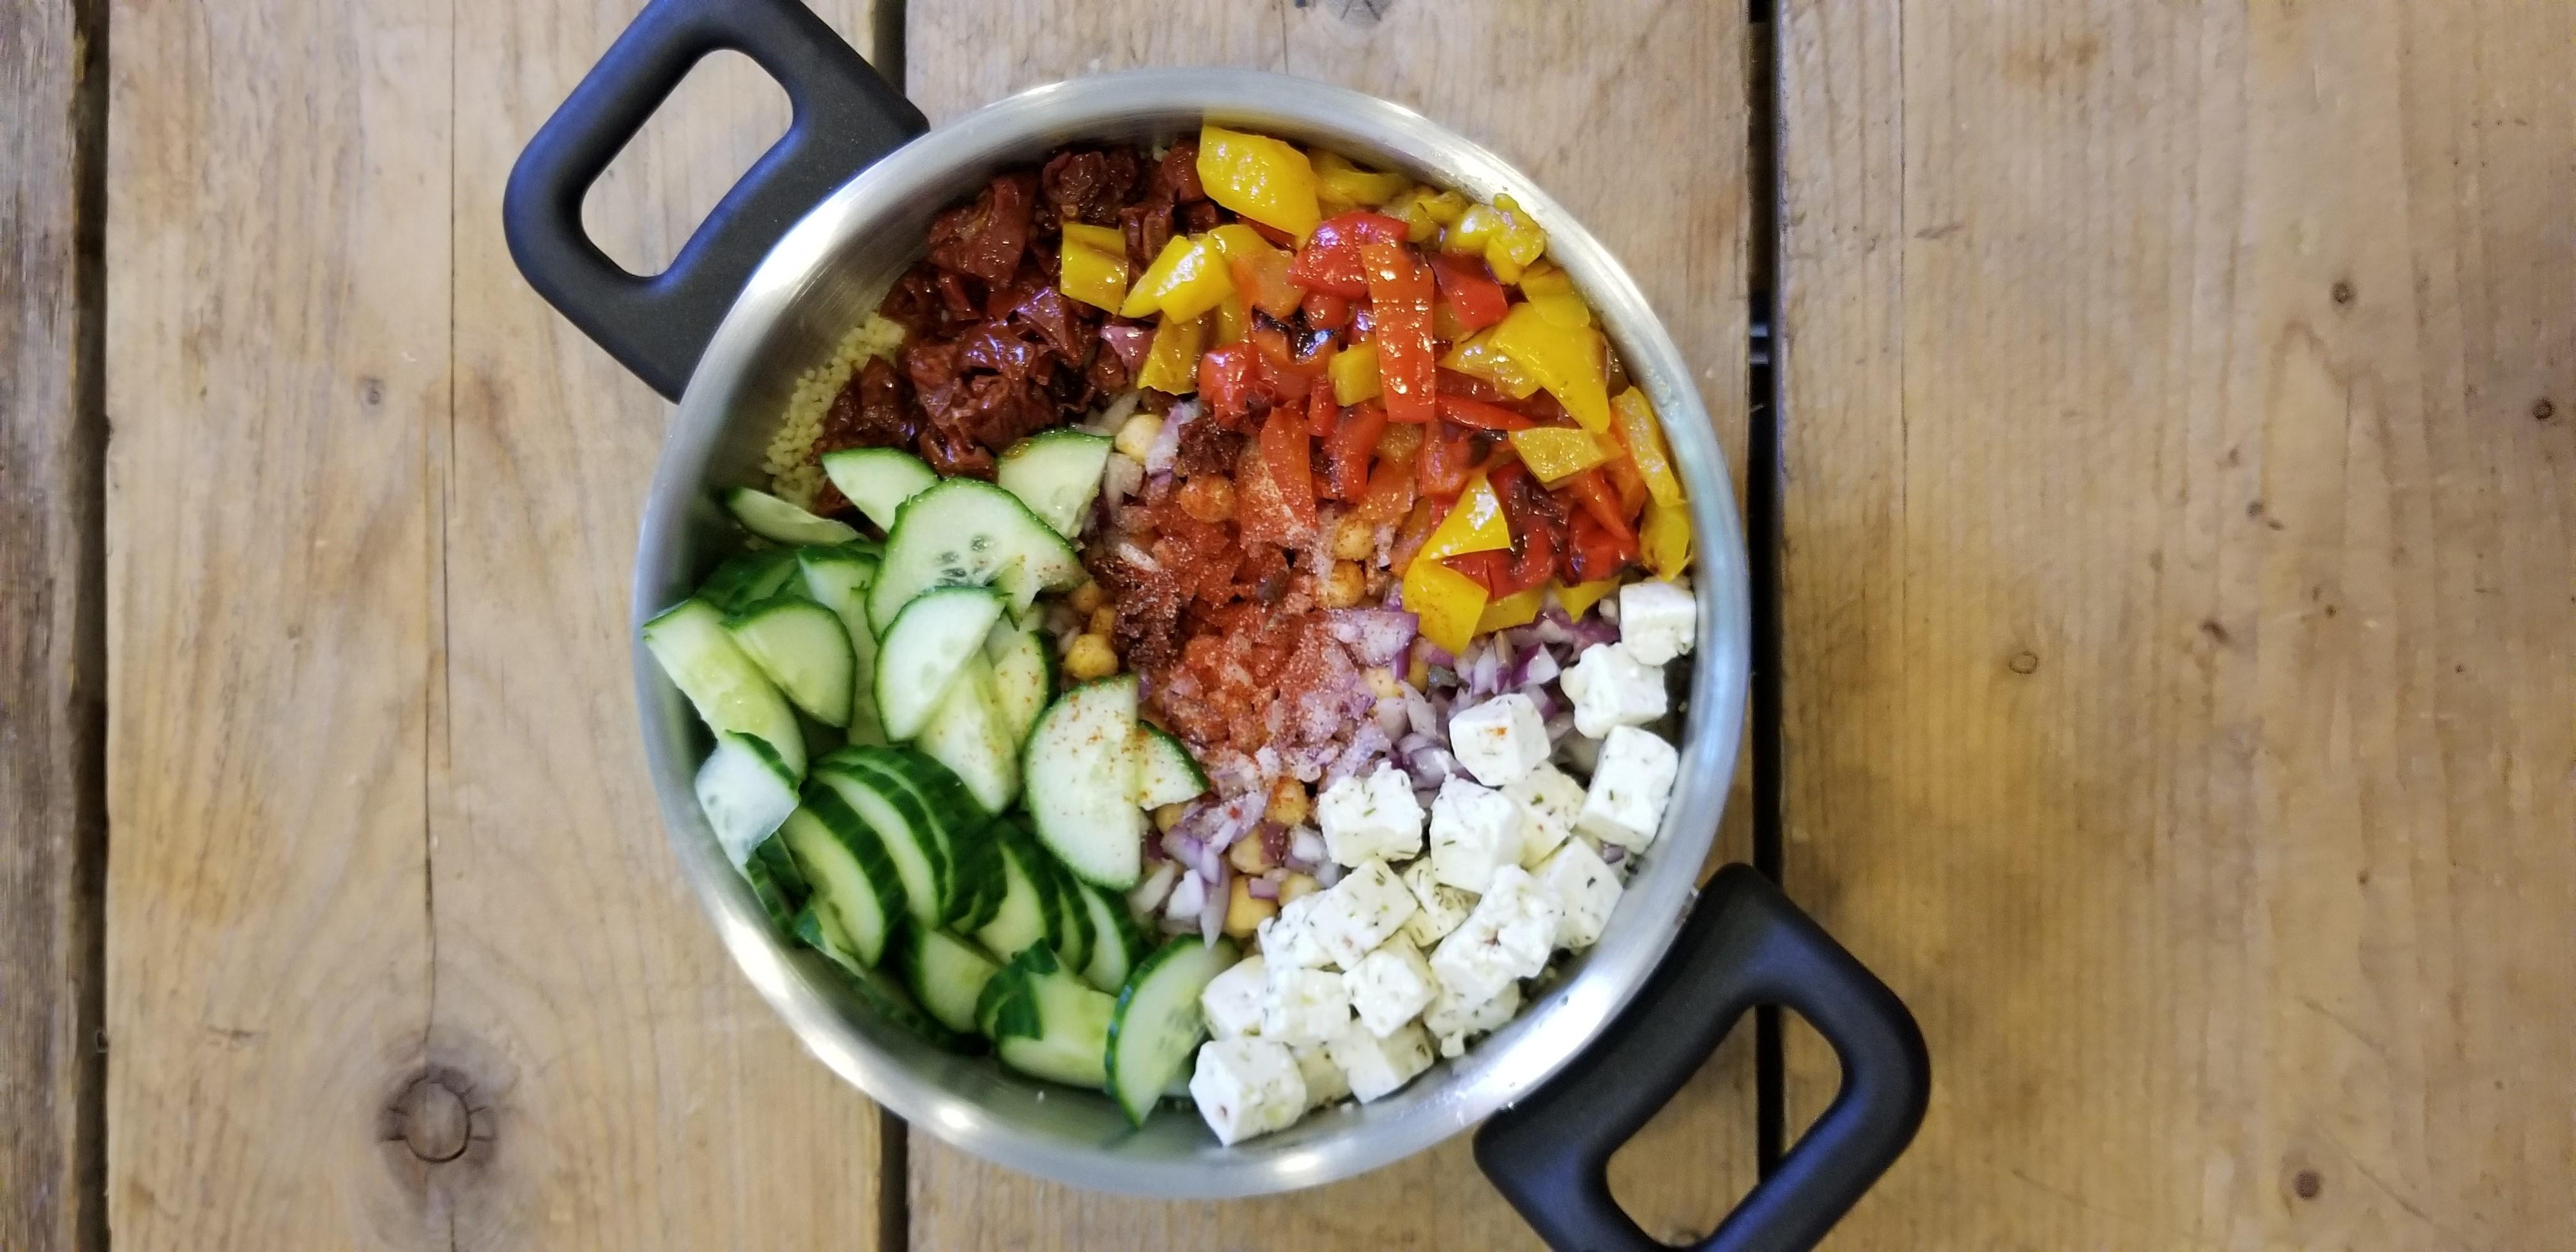 couscous salade met feta en kikkererwten in pan